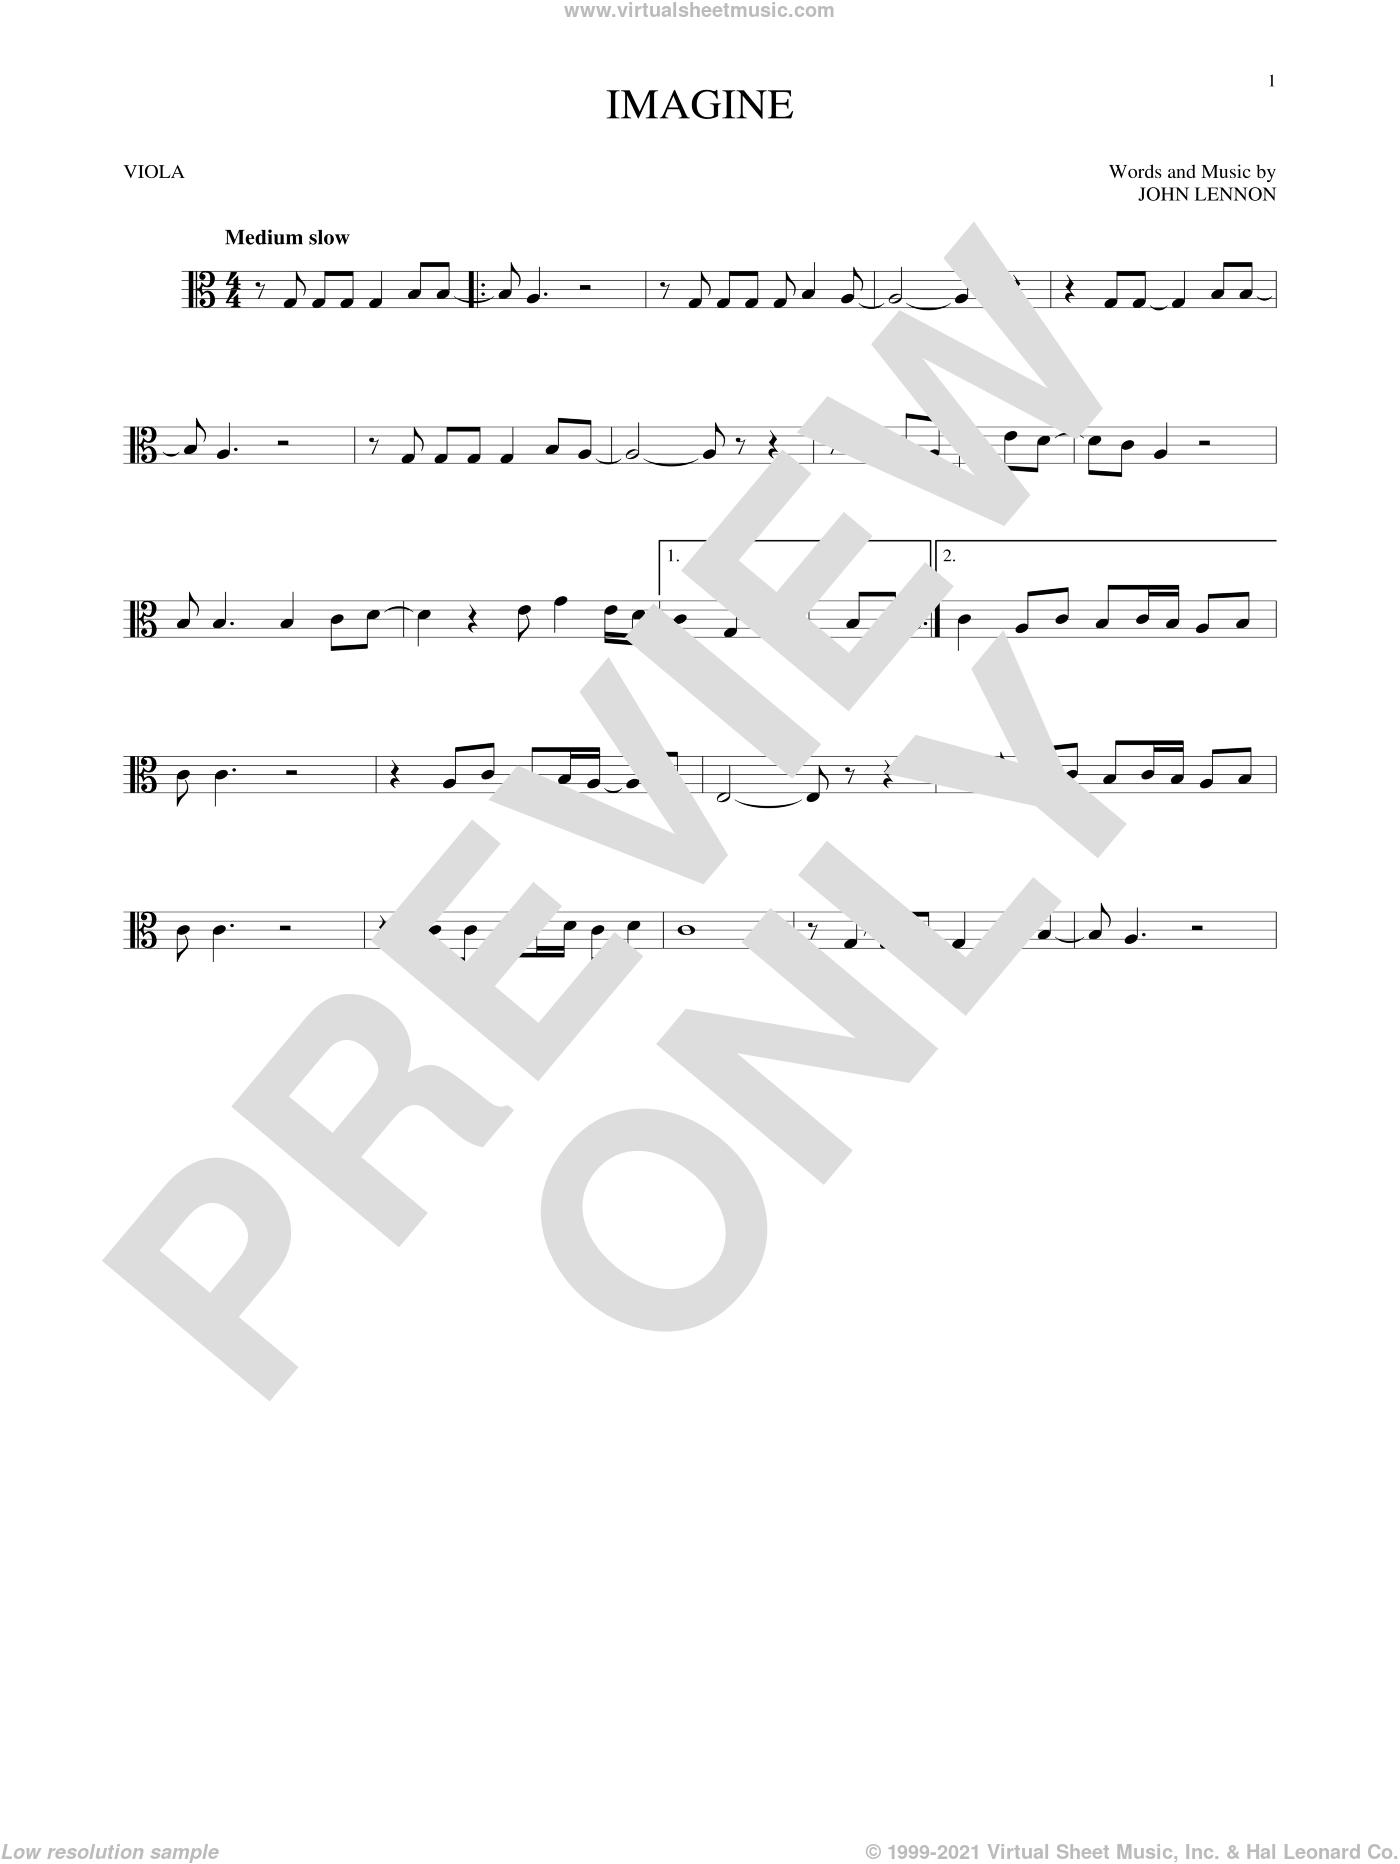 Imagine sheet music for viola solo by John Lennon, intermediate skill level